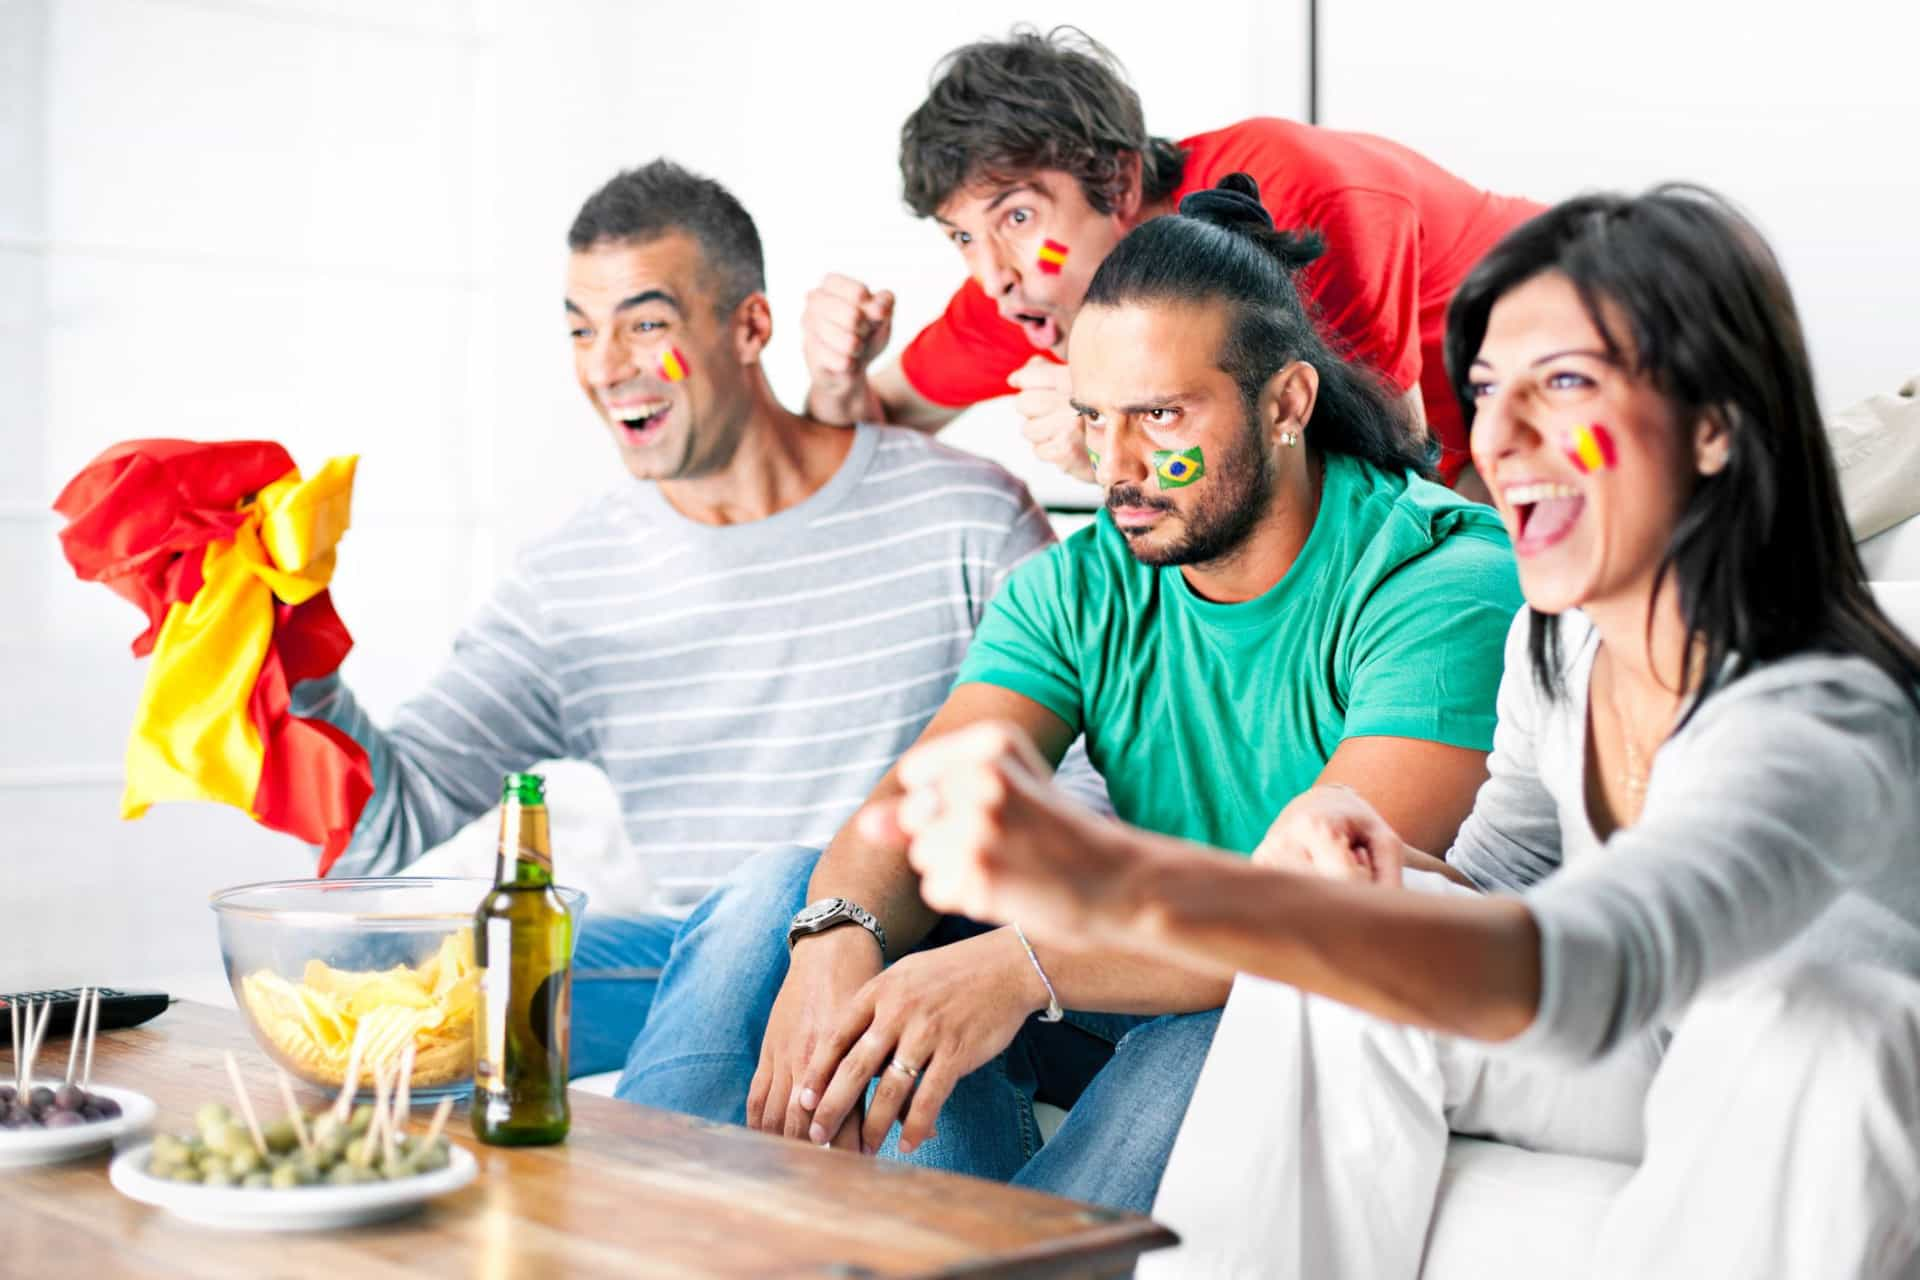 Mundial 2018: Os melhores aperitivos para saborear durante os jogos